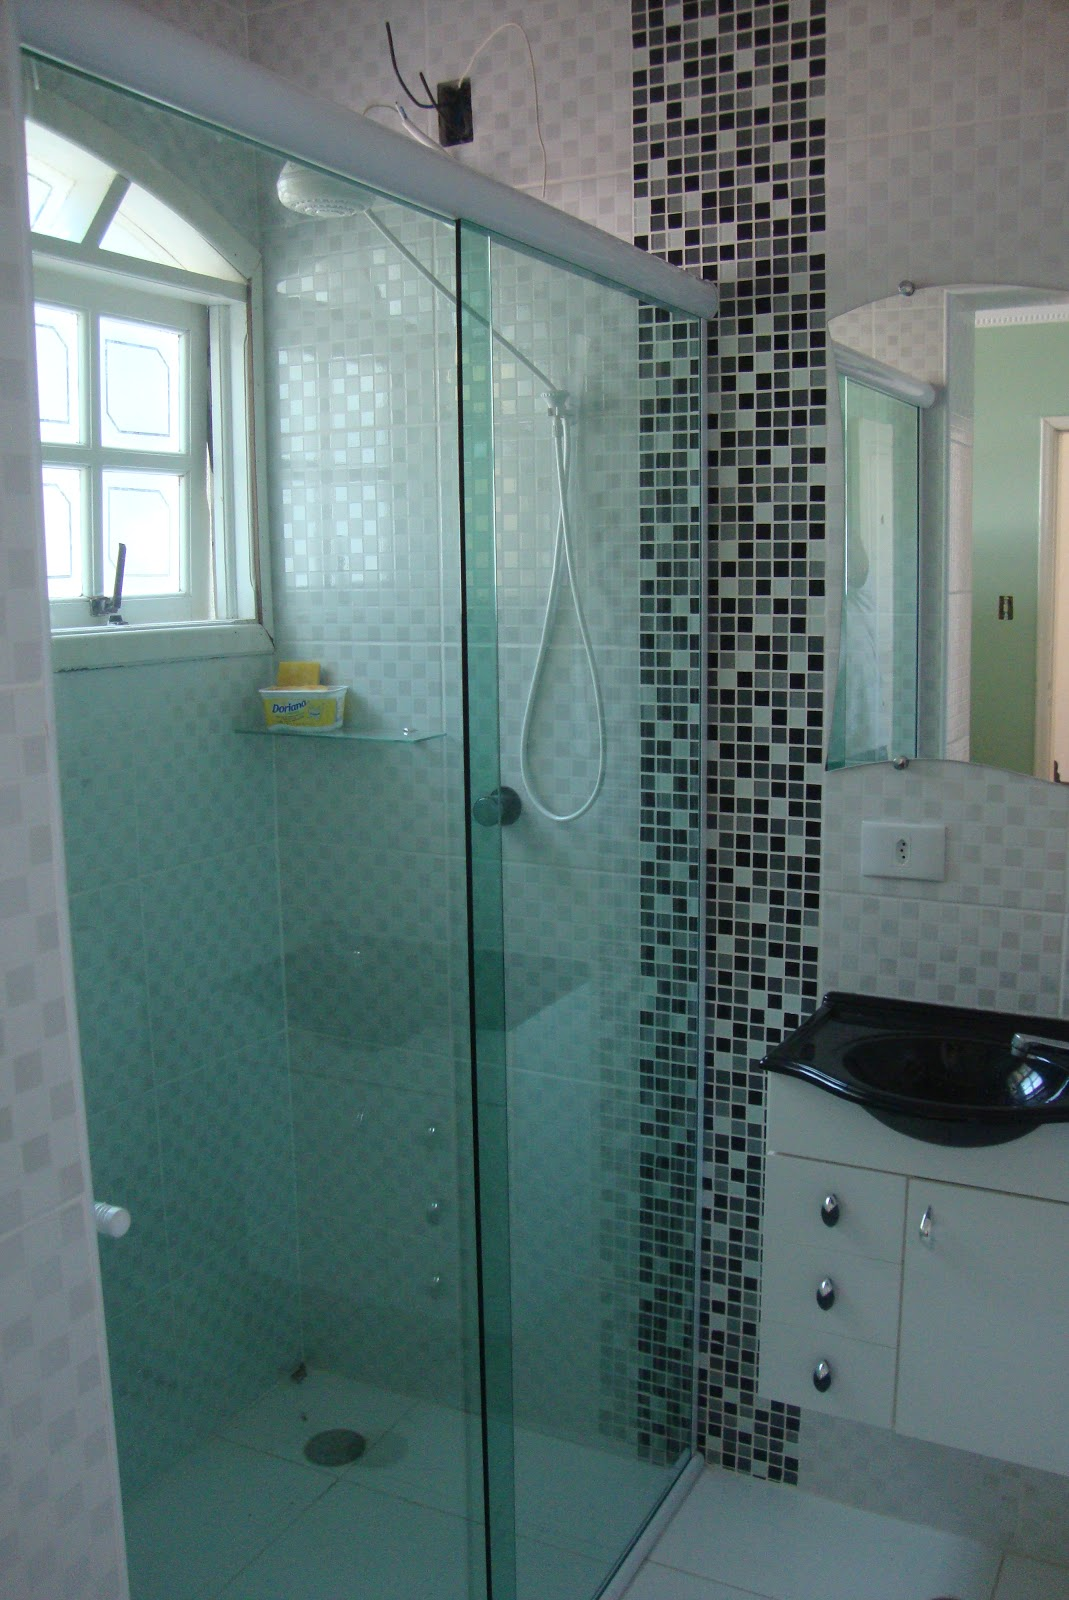 Vidraçaria Monter vidros: Box Frontal Vidro Verde kit Branco #4C7F7F 1069x1600 Banheiro Branco Com Box Verde